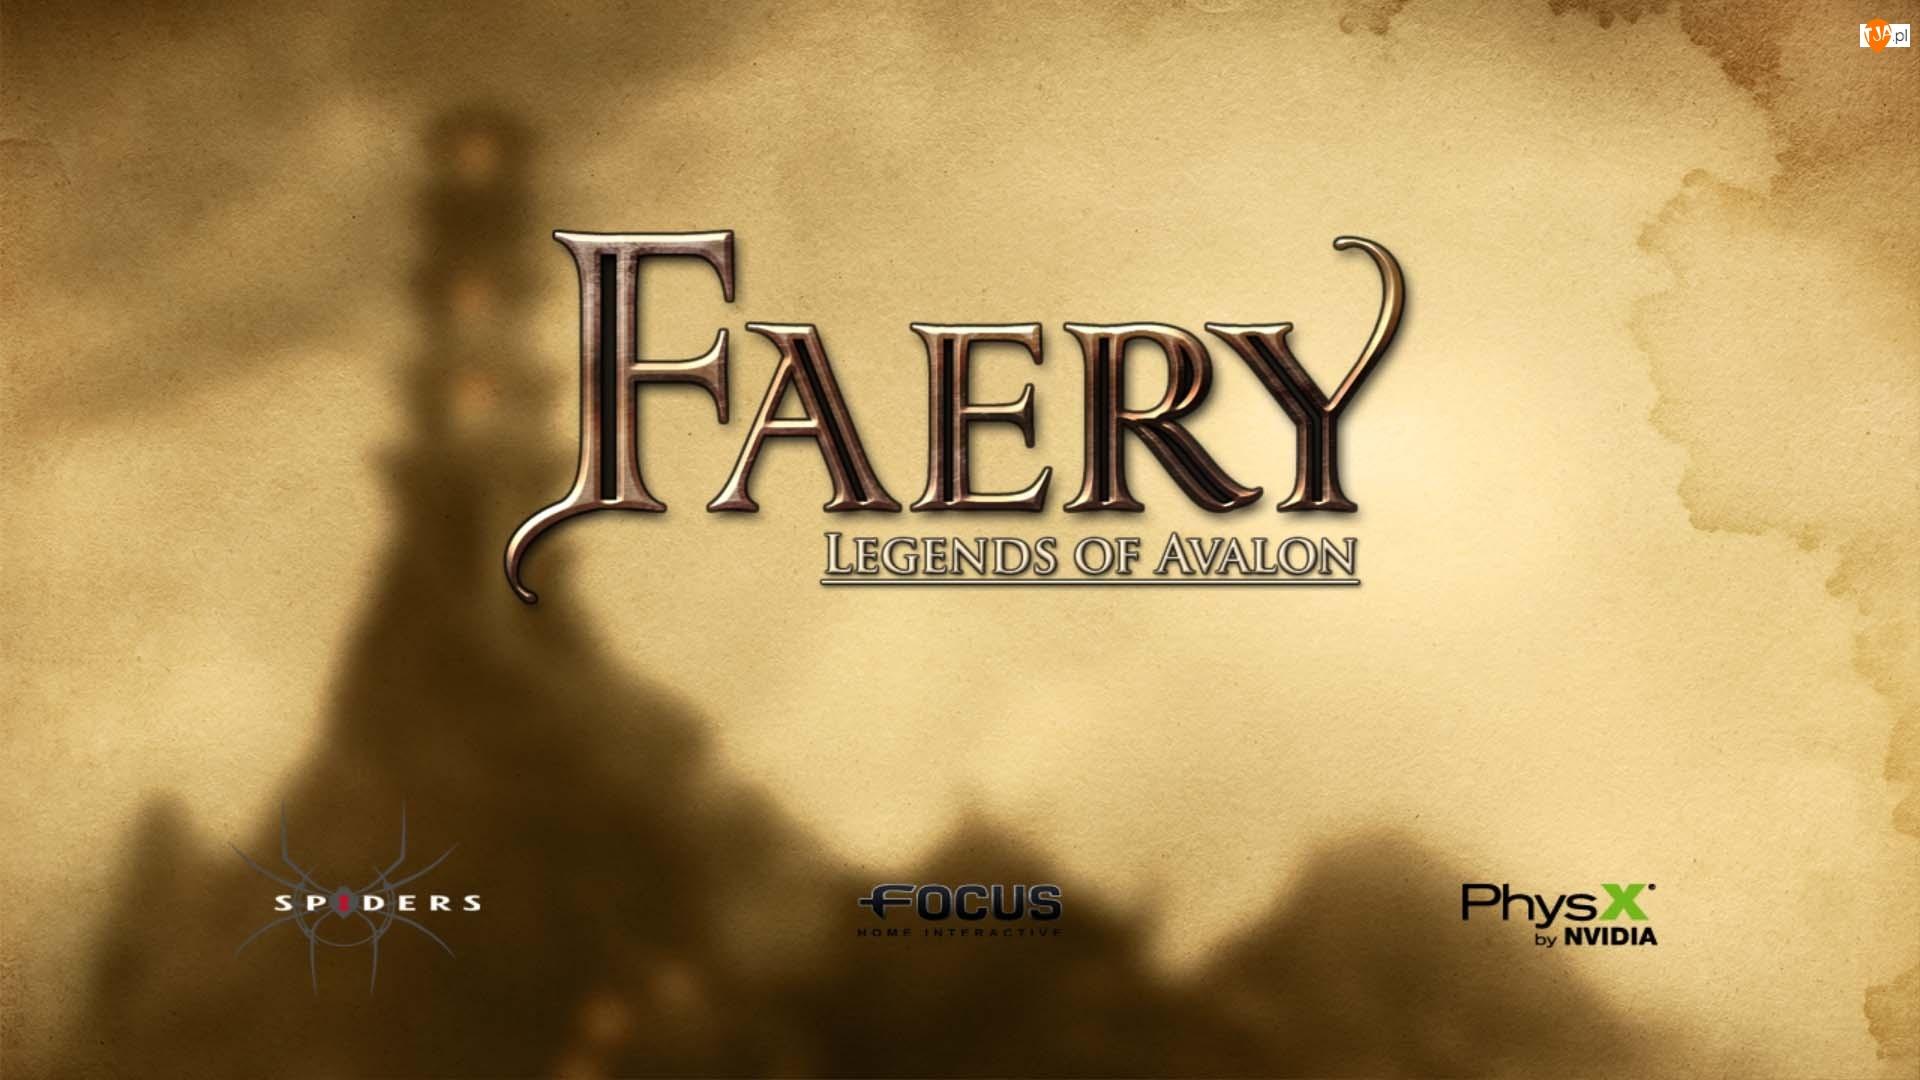 Faery - legends of avalon review